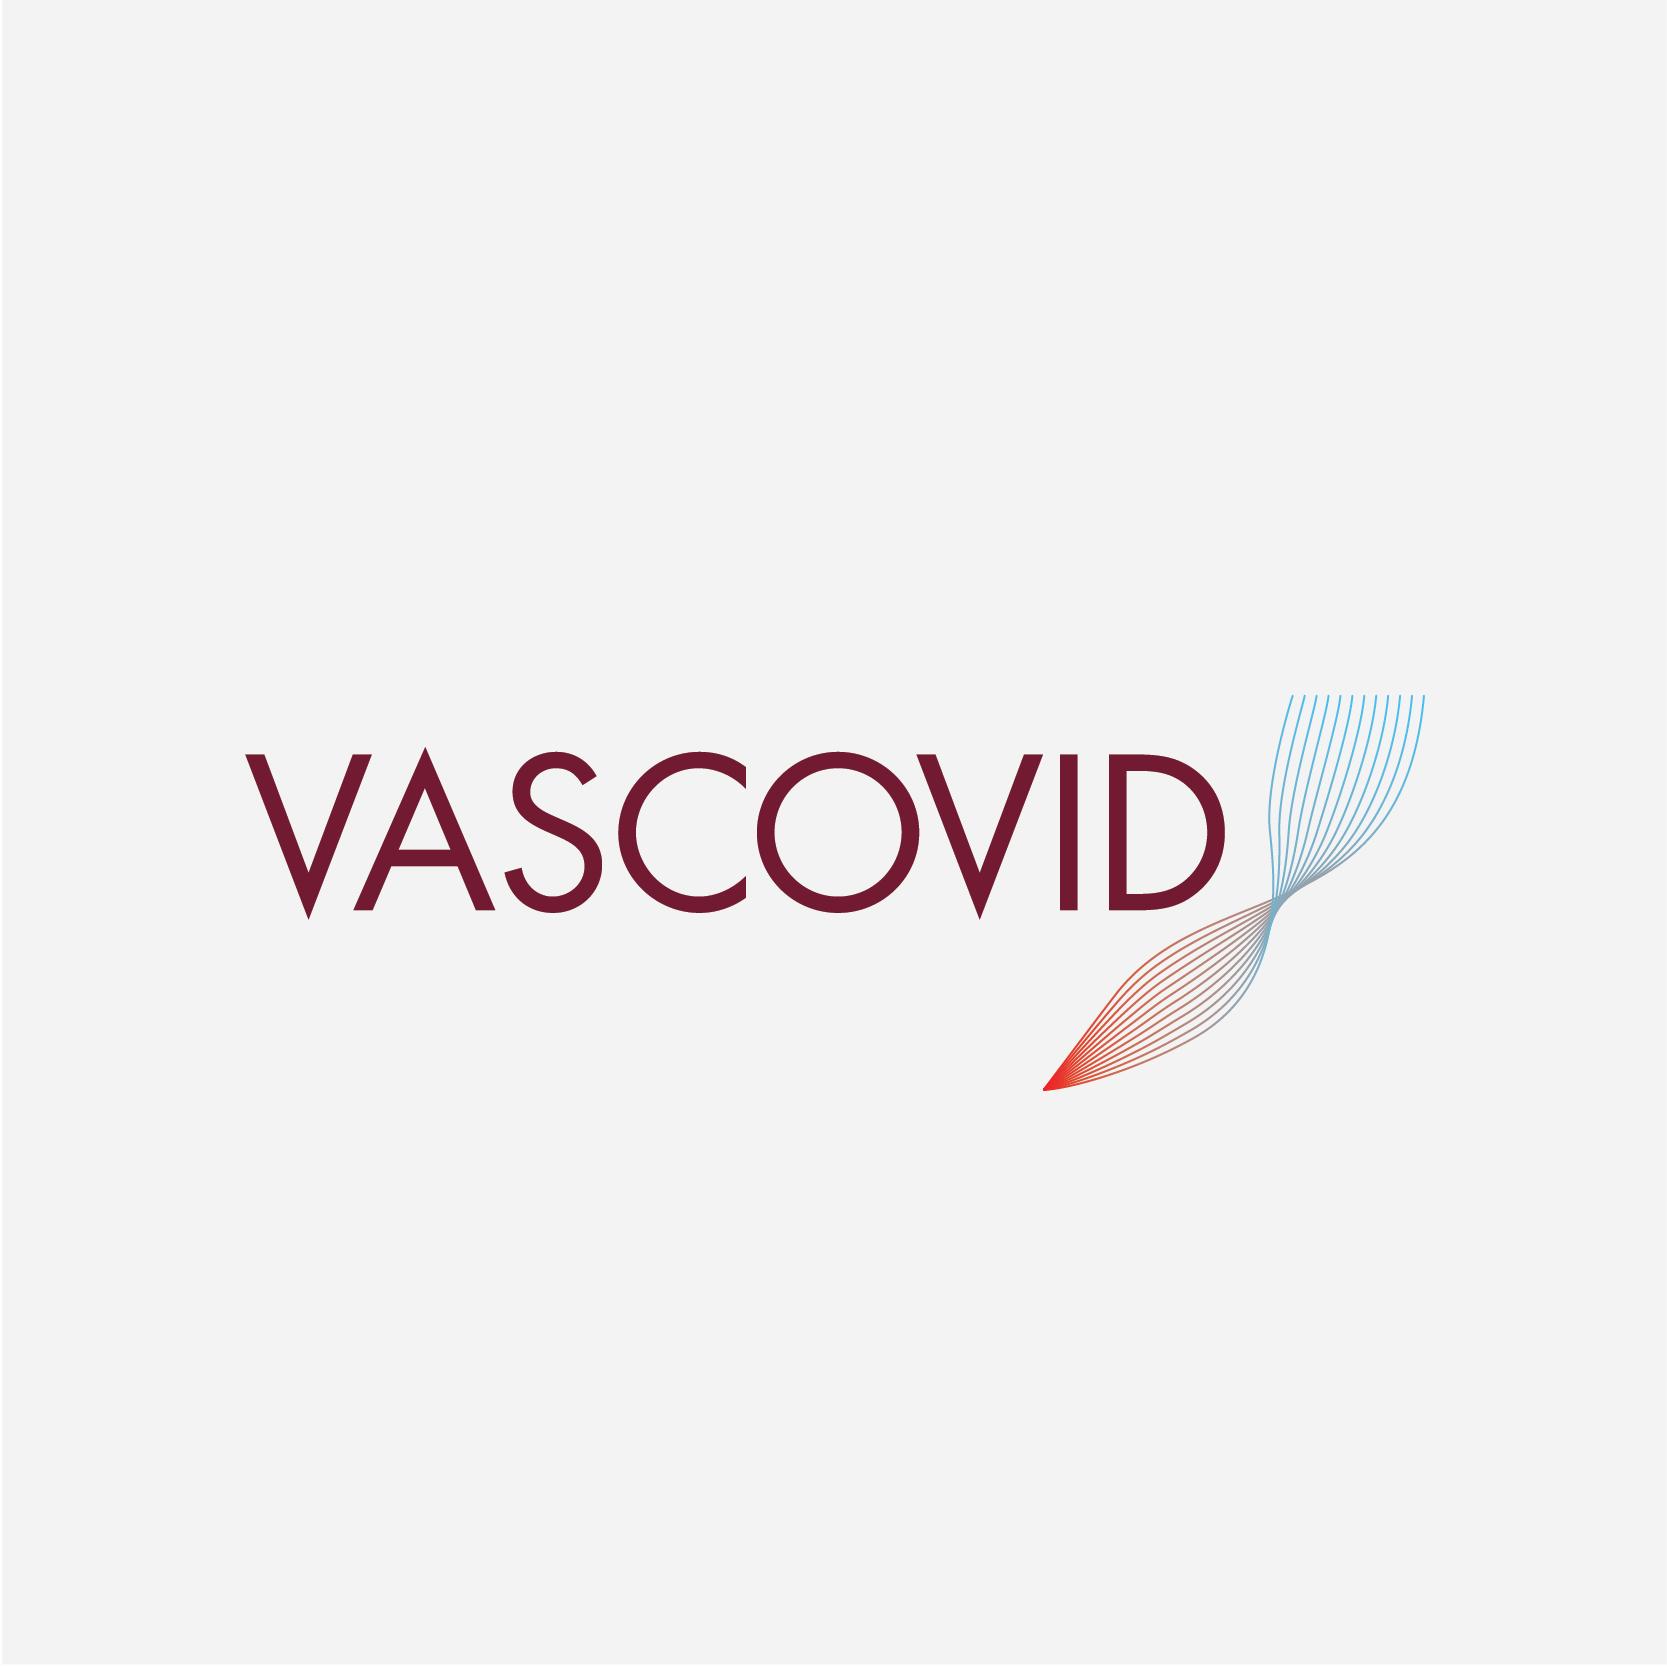 Bitflow-studio-logo-scientific-project-vascovid-1